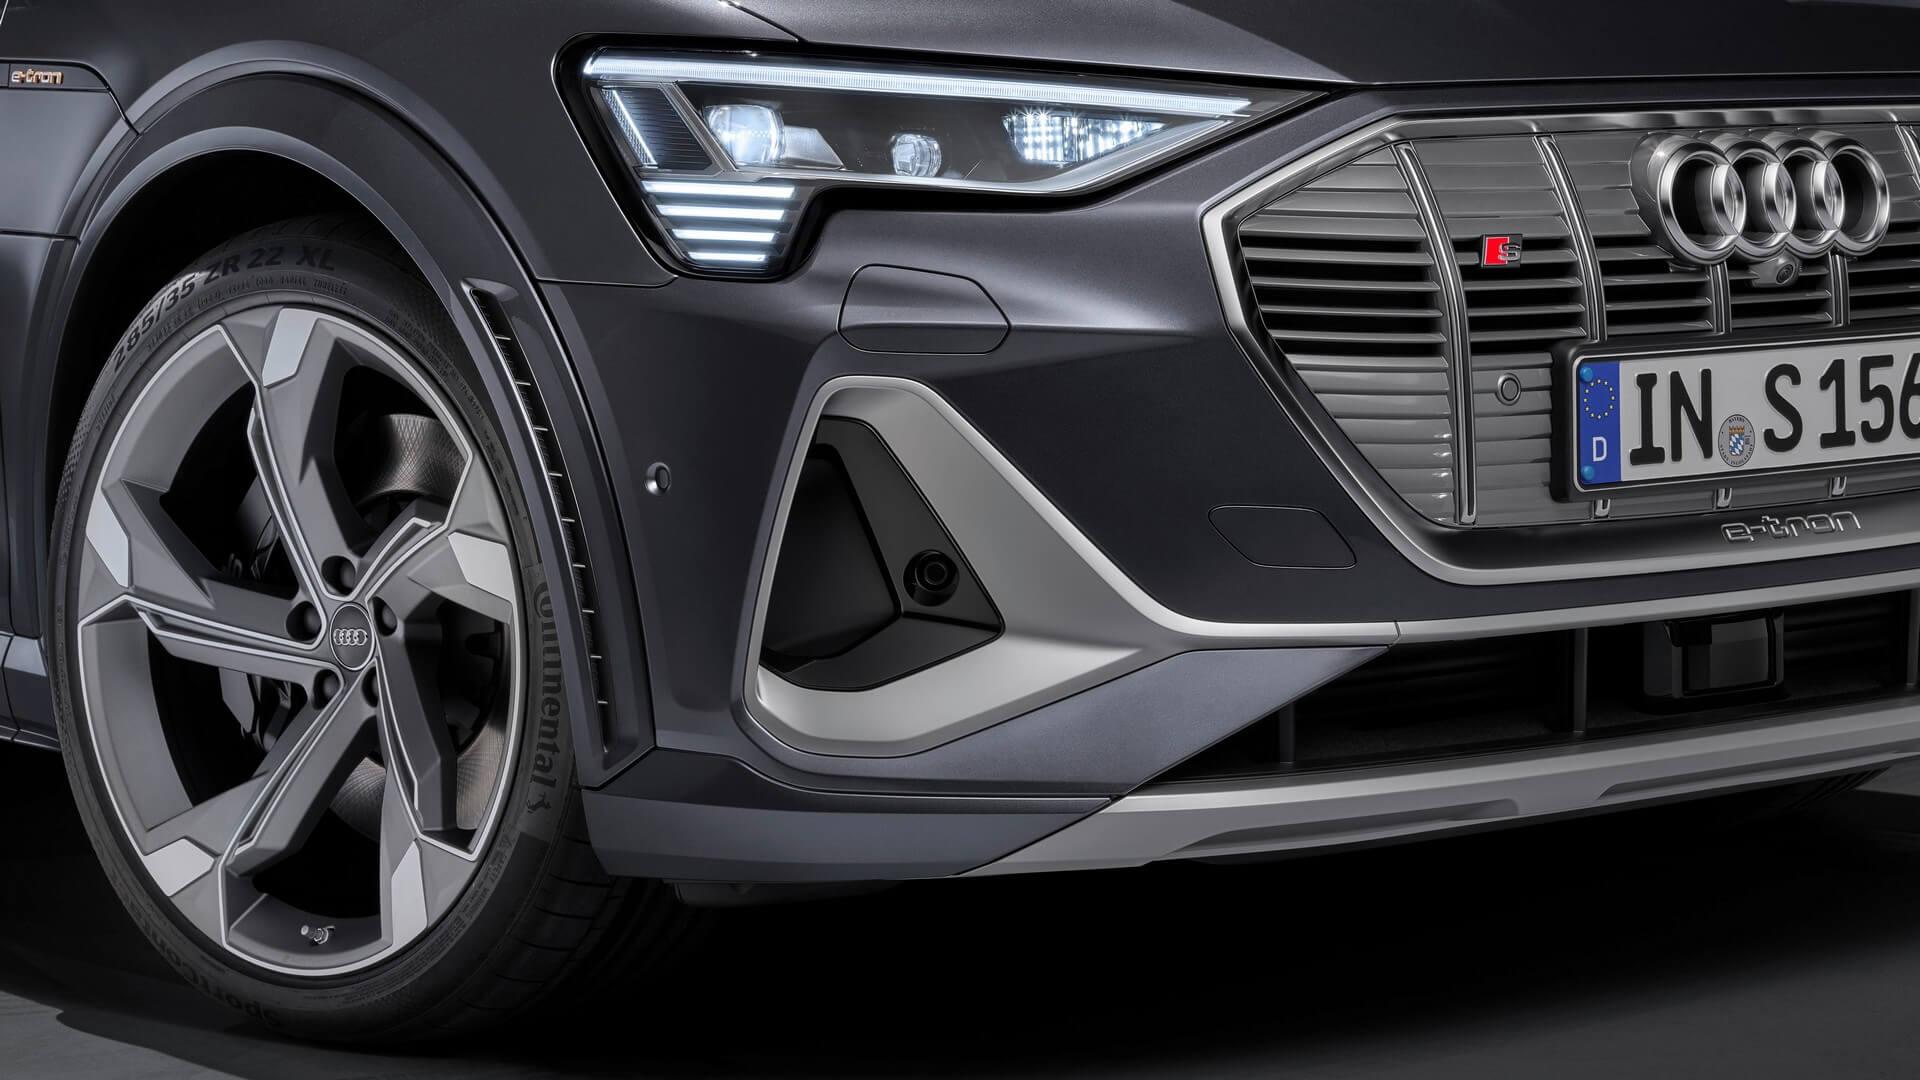 Audi-E-Tron-S-and-E-Tron-S-Sportback-2020-93